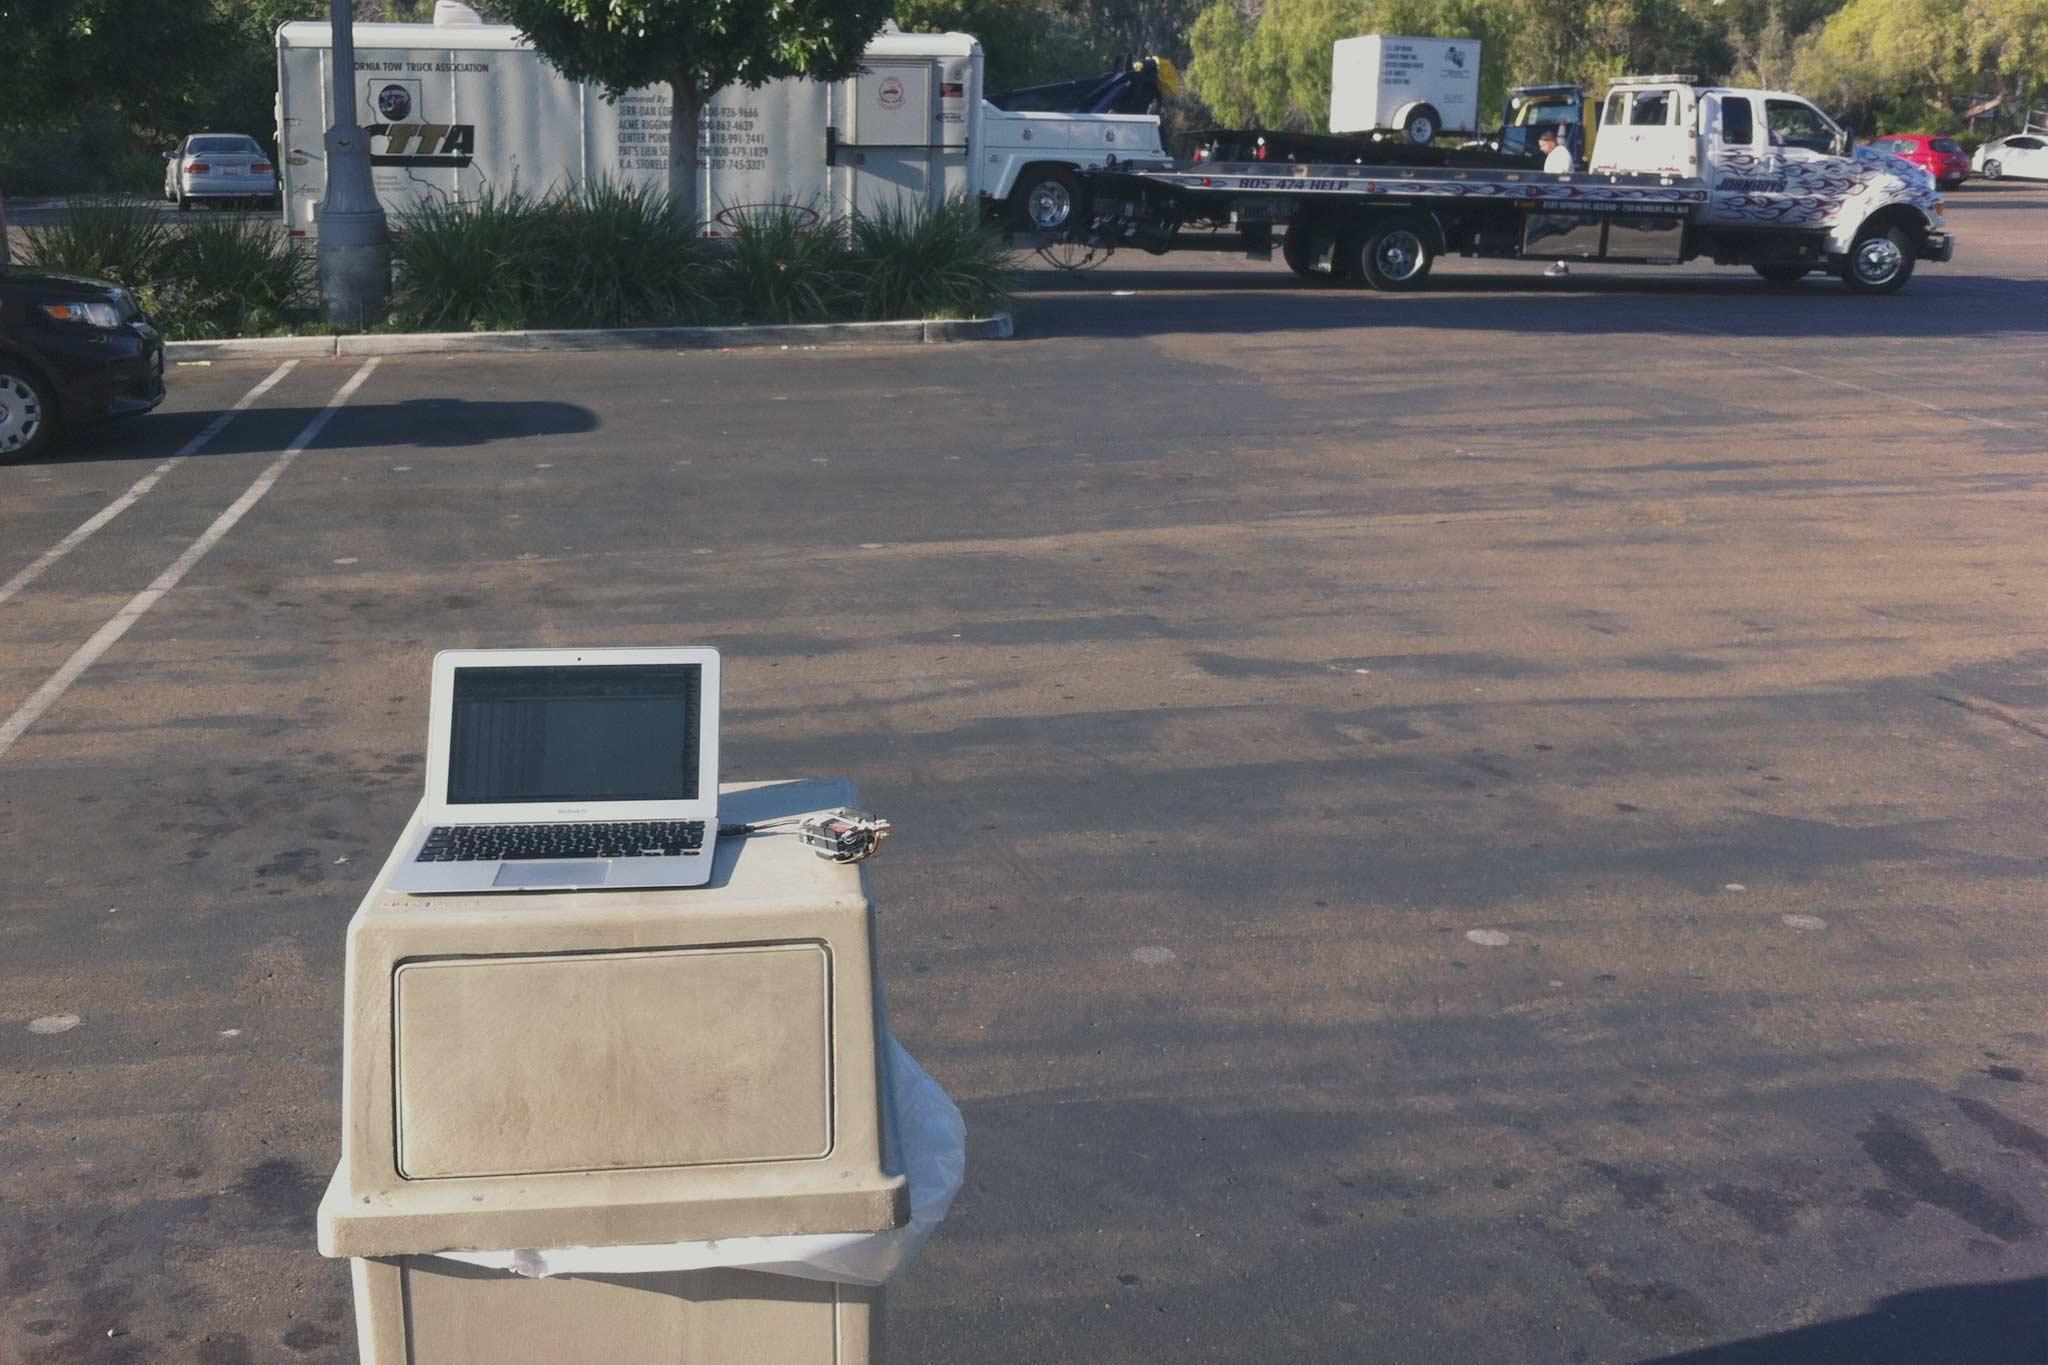 Air Sensing, Pollution Tracking and DIY Testing at 4S